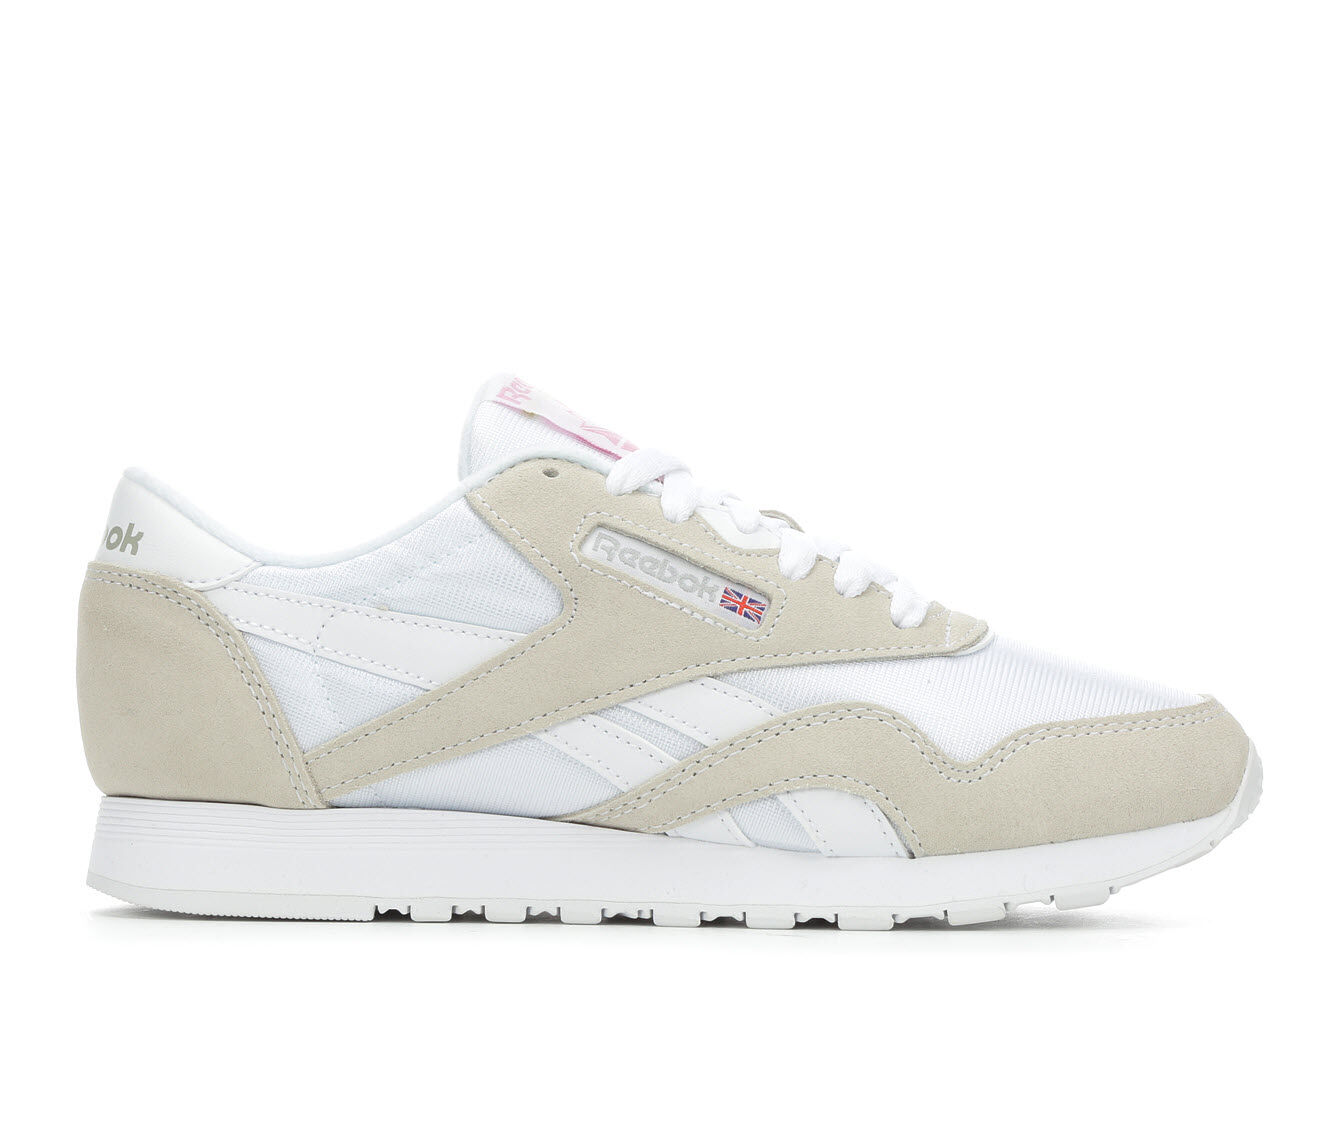 Women's Reebok Classic Nylon Retro Sneakers White/Grey